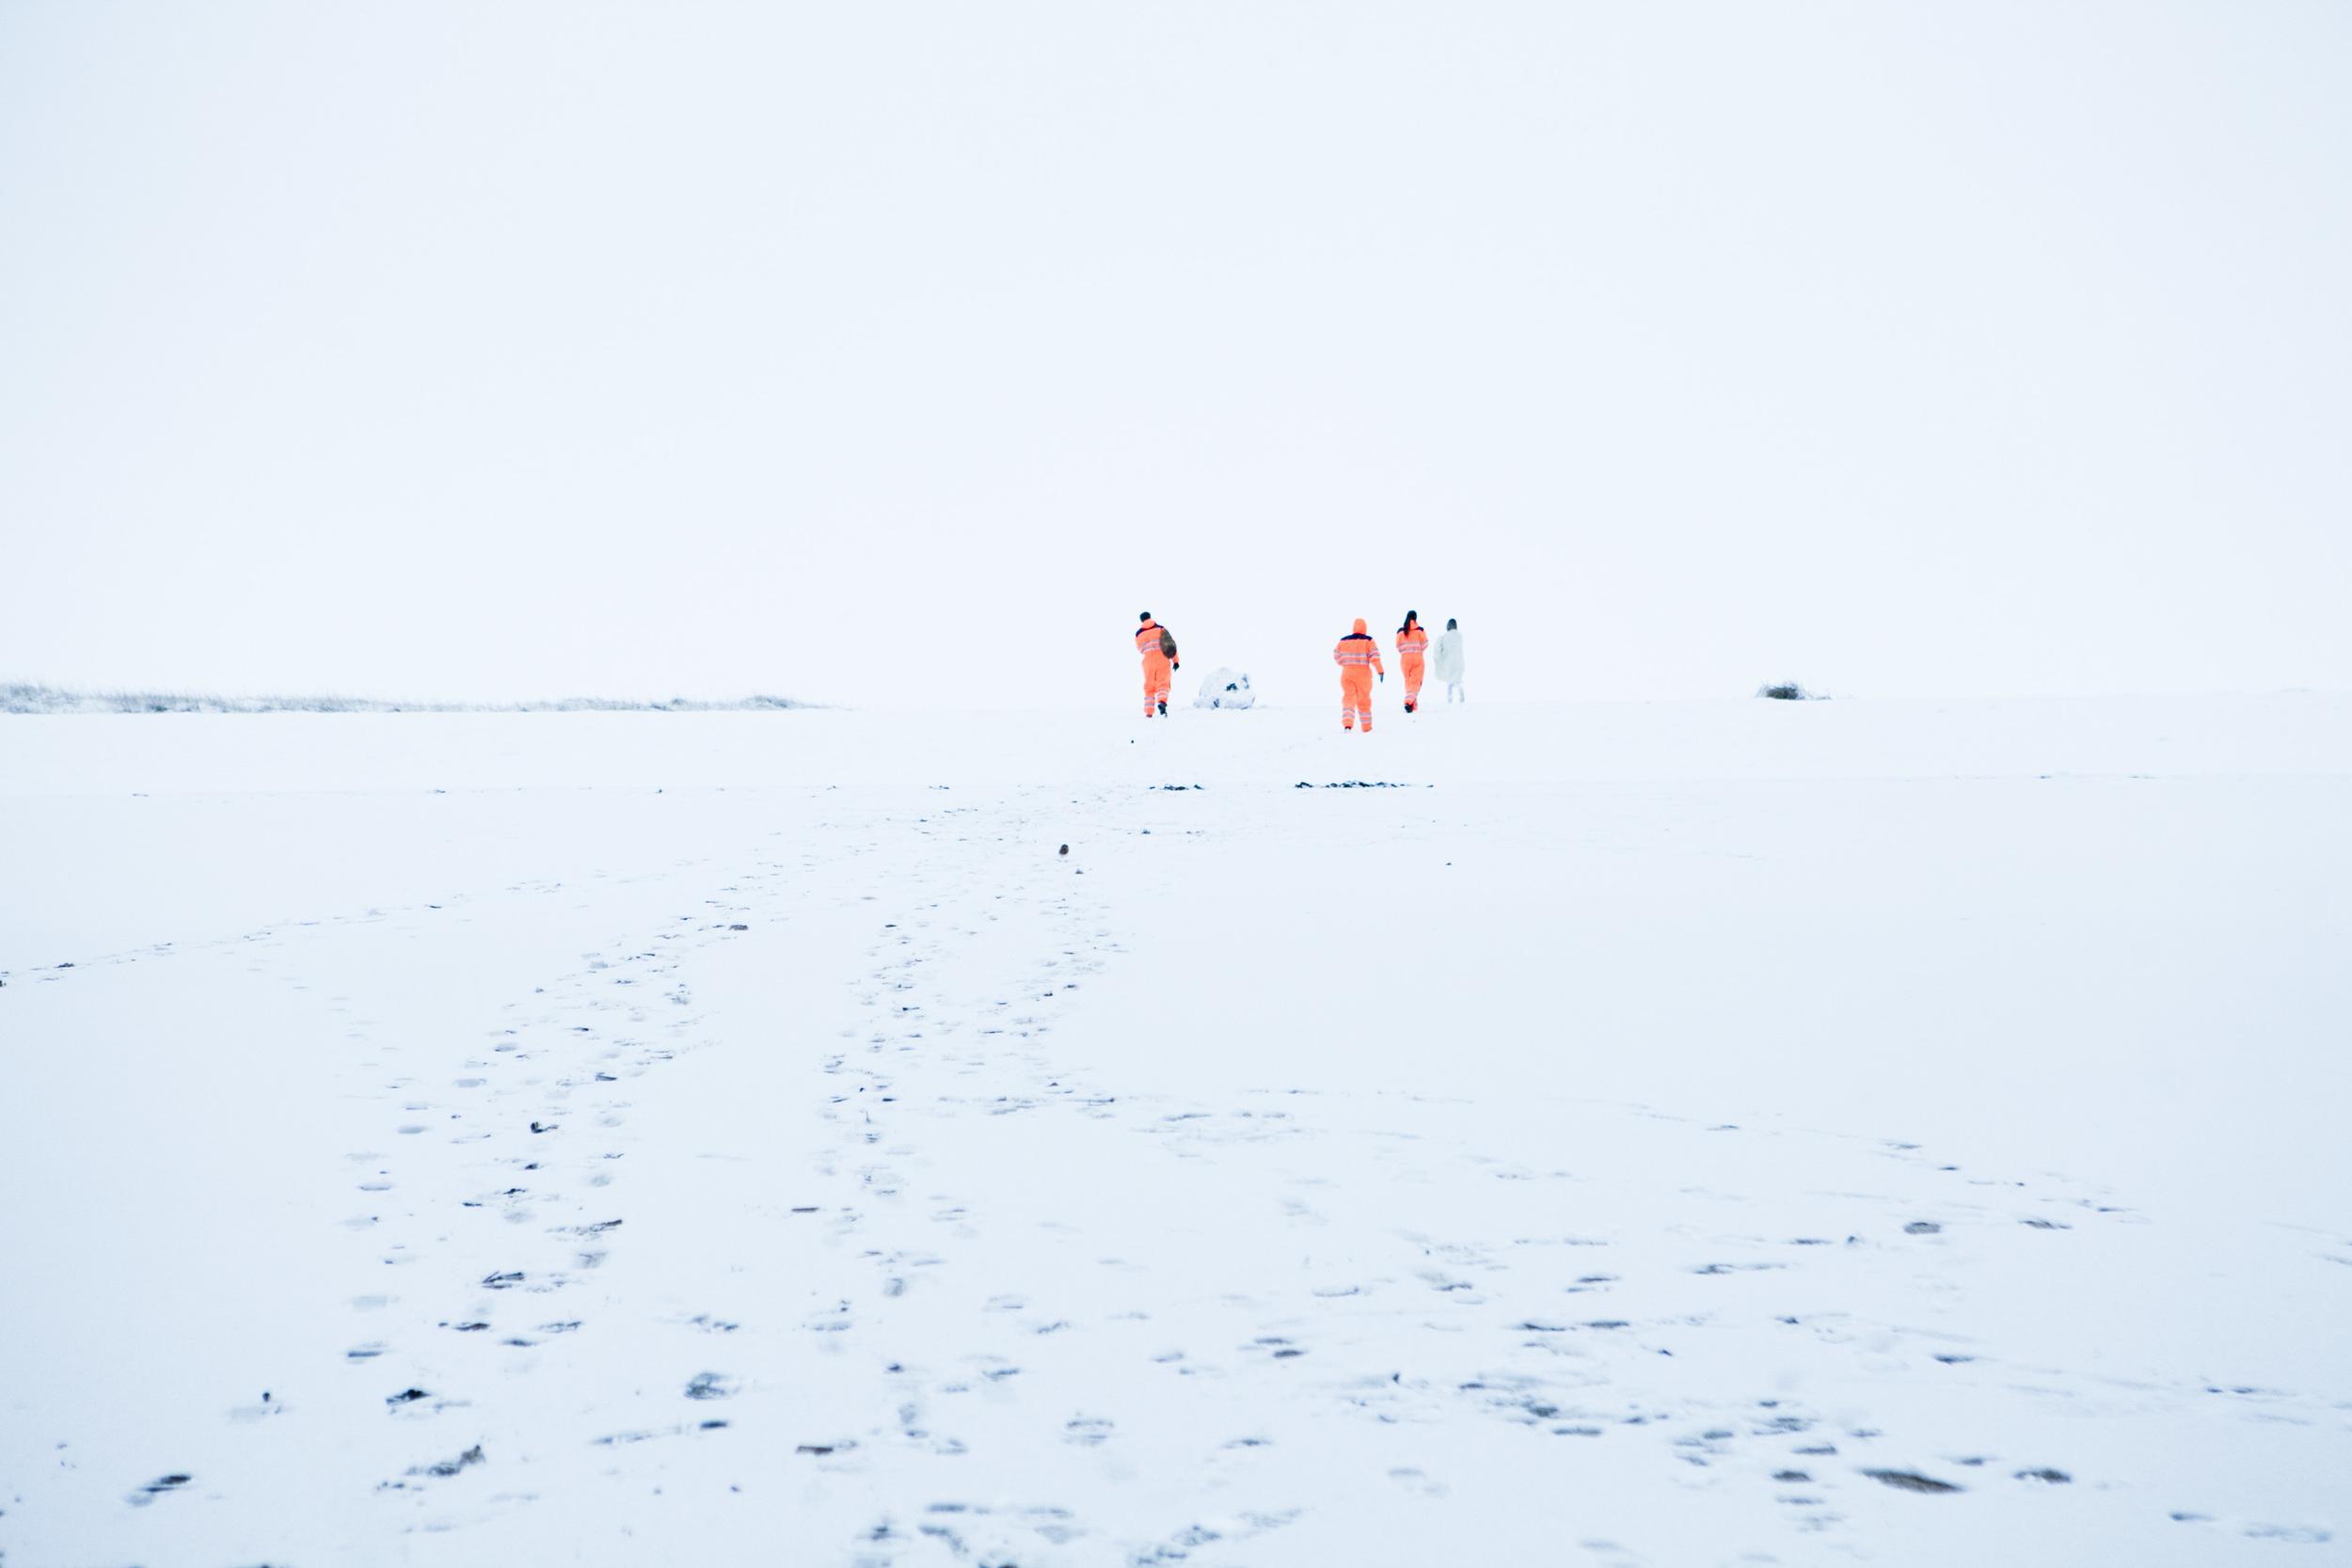 The orange suits kept following me